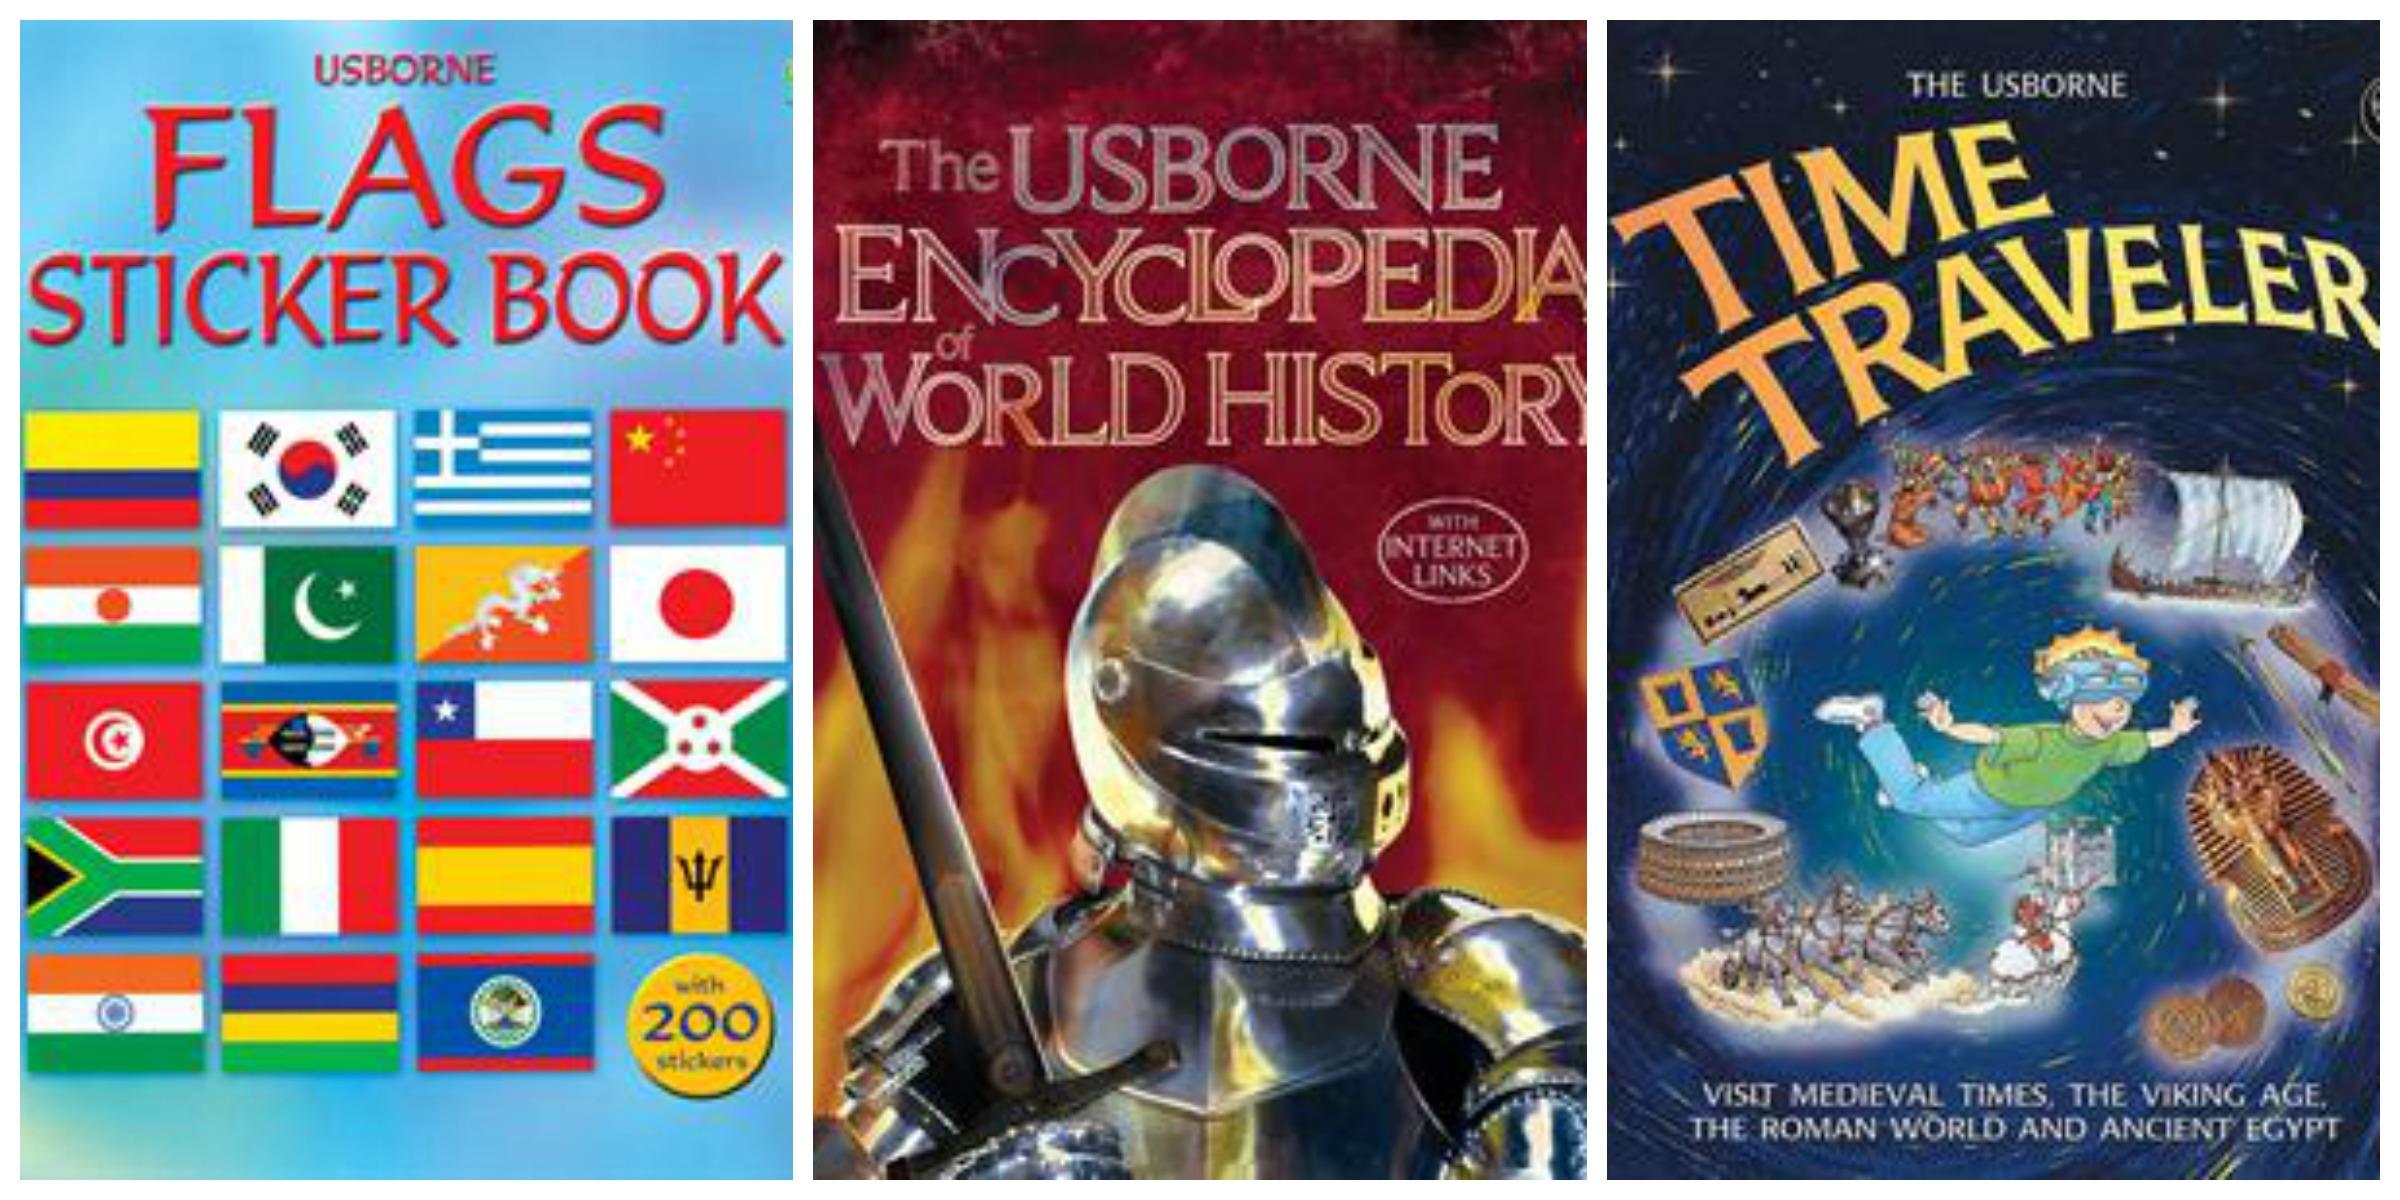 Flags, World History & Time Traveler